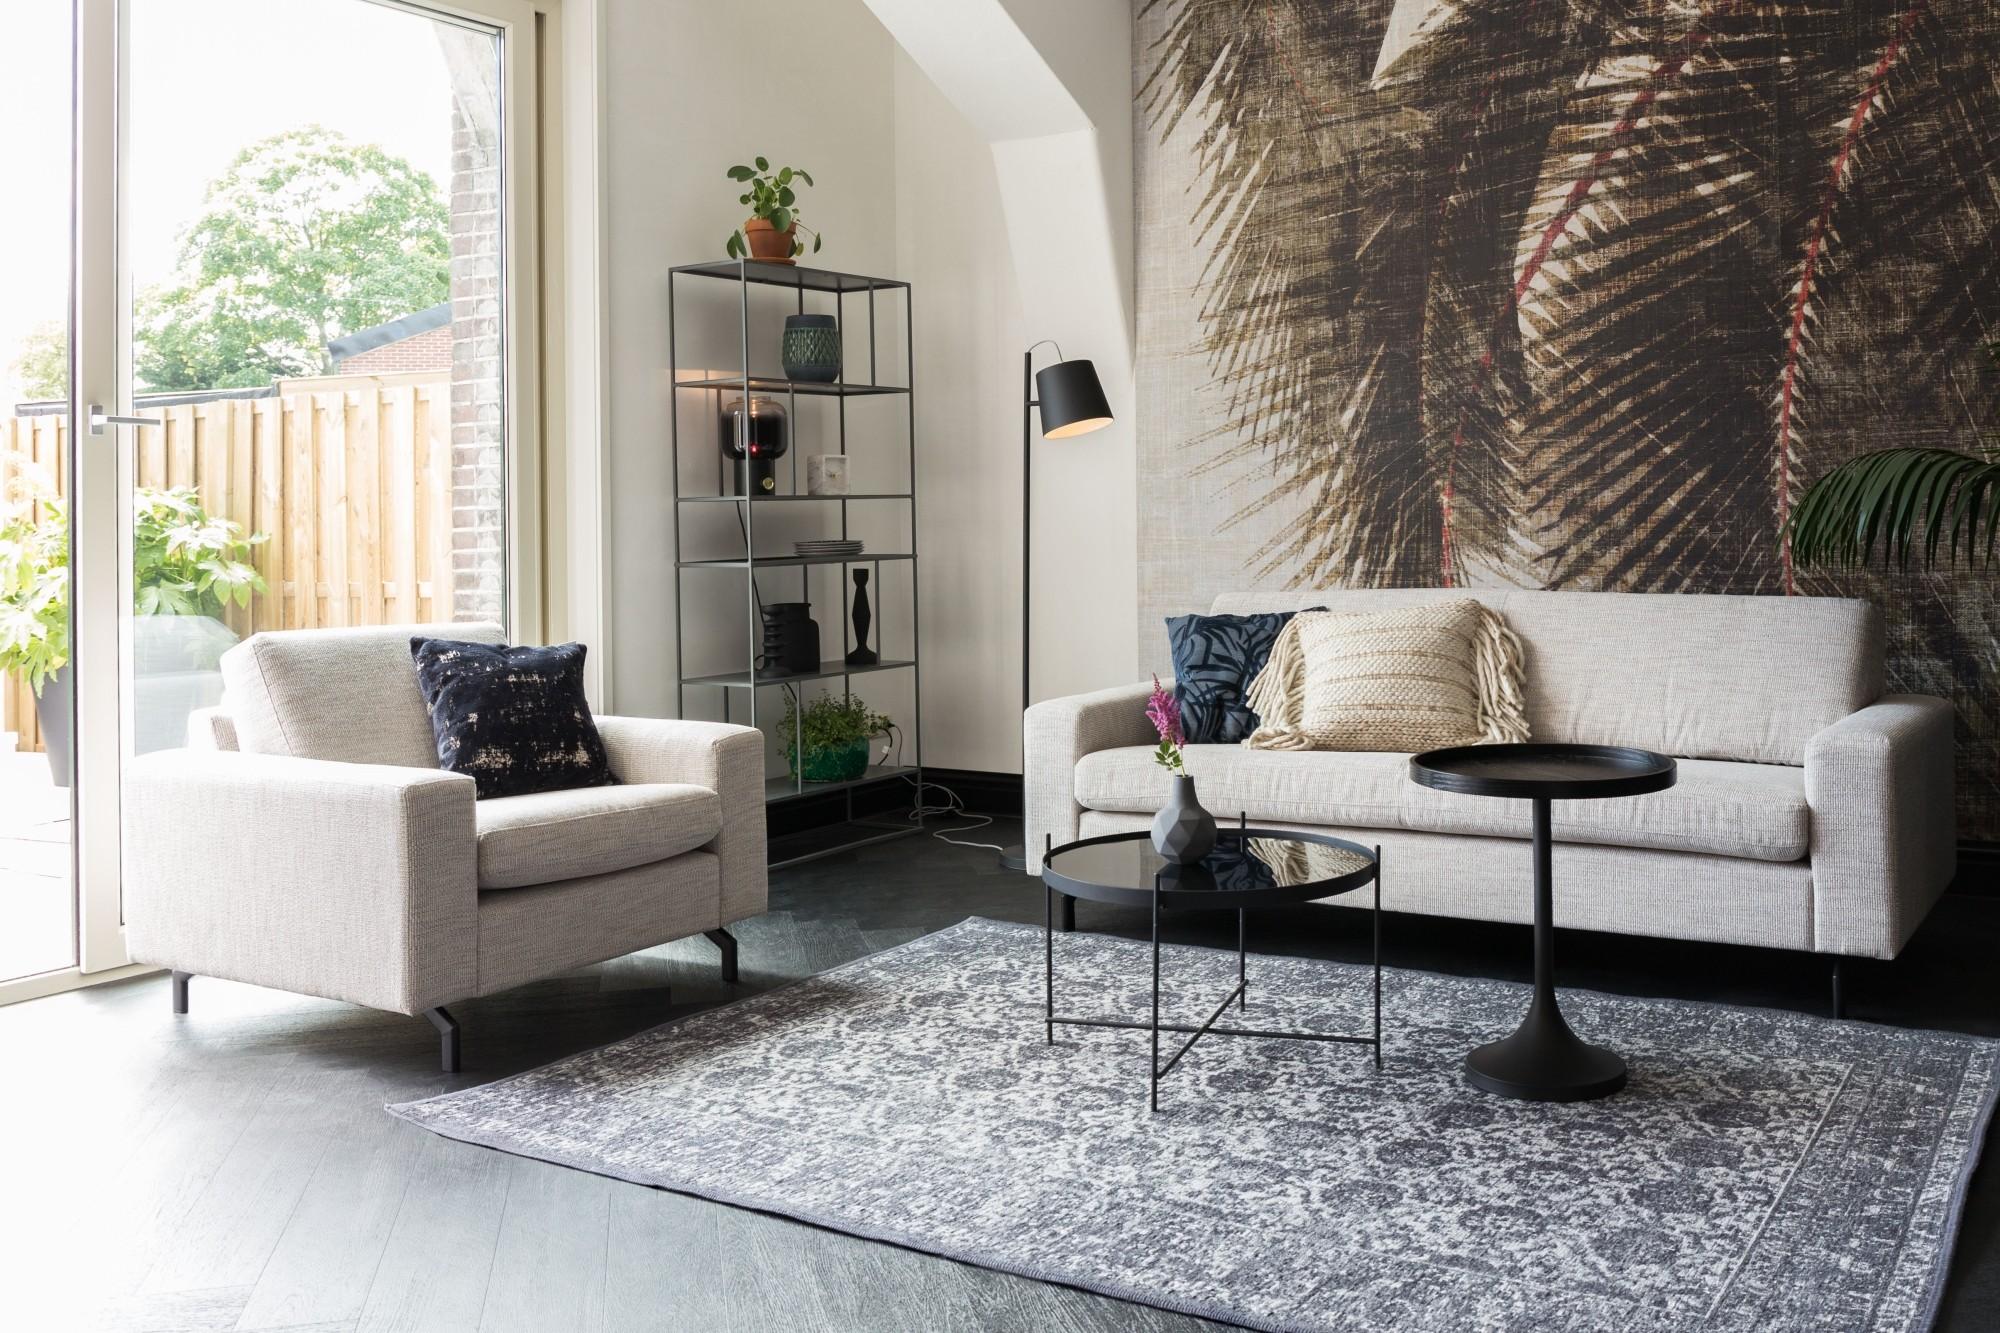 Malva tapijt zuiver puur design interieur